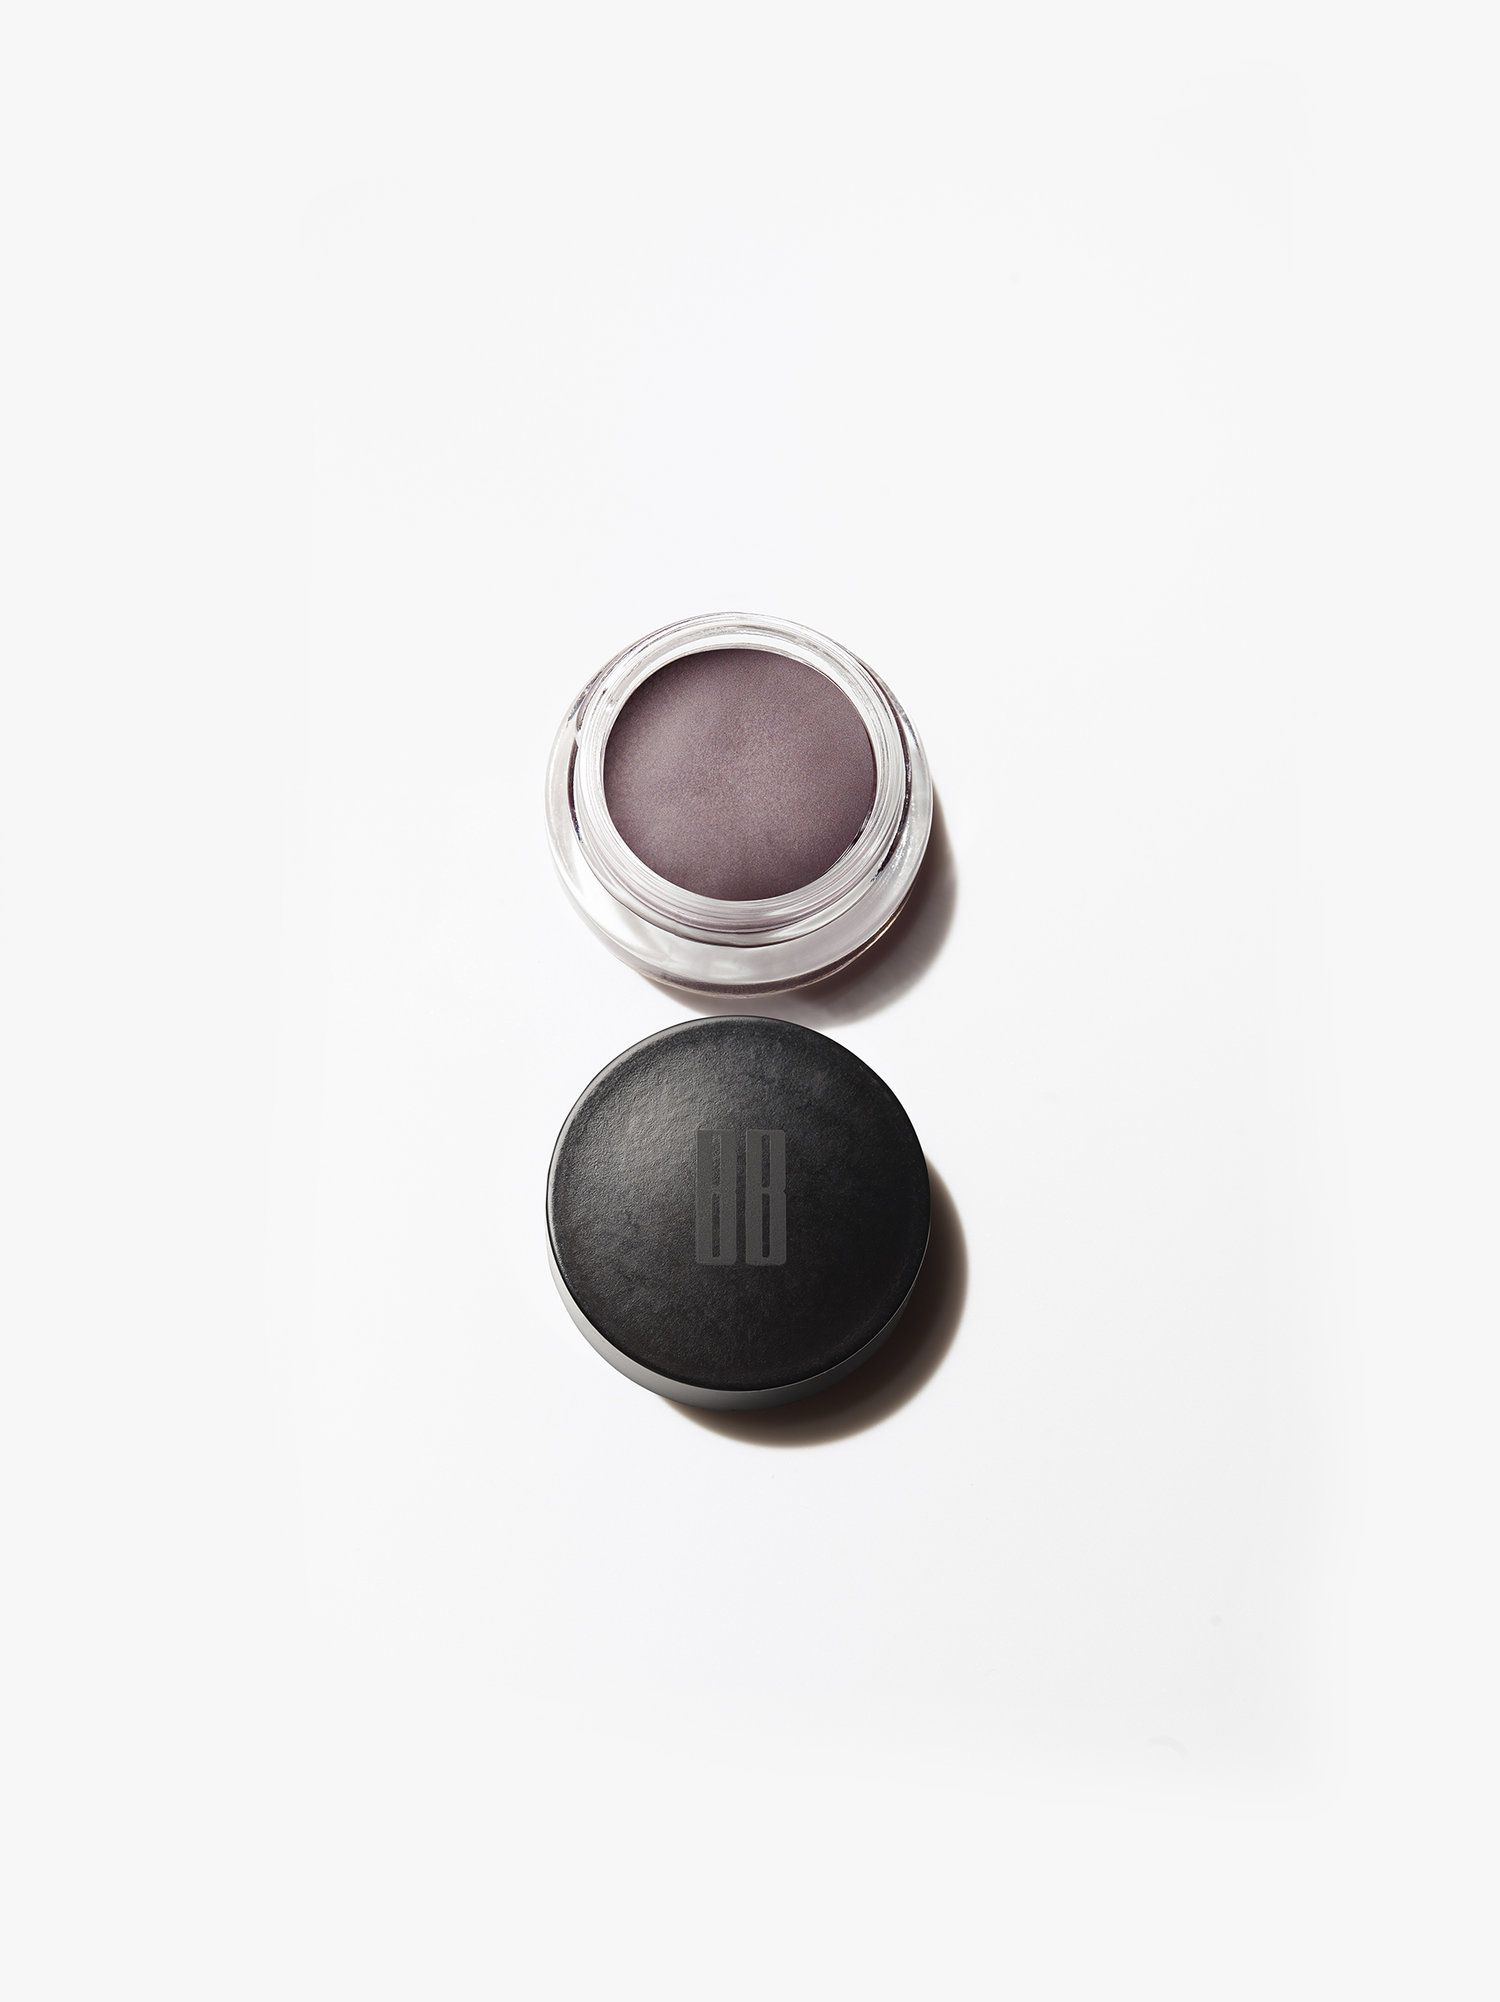 Baby love balm lip + cheek tint